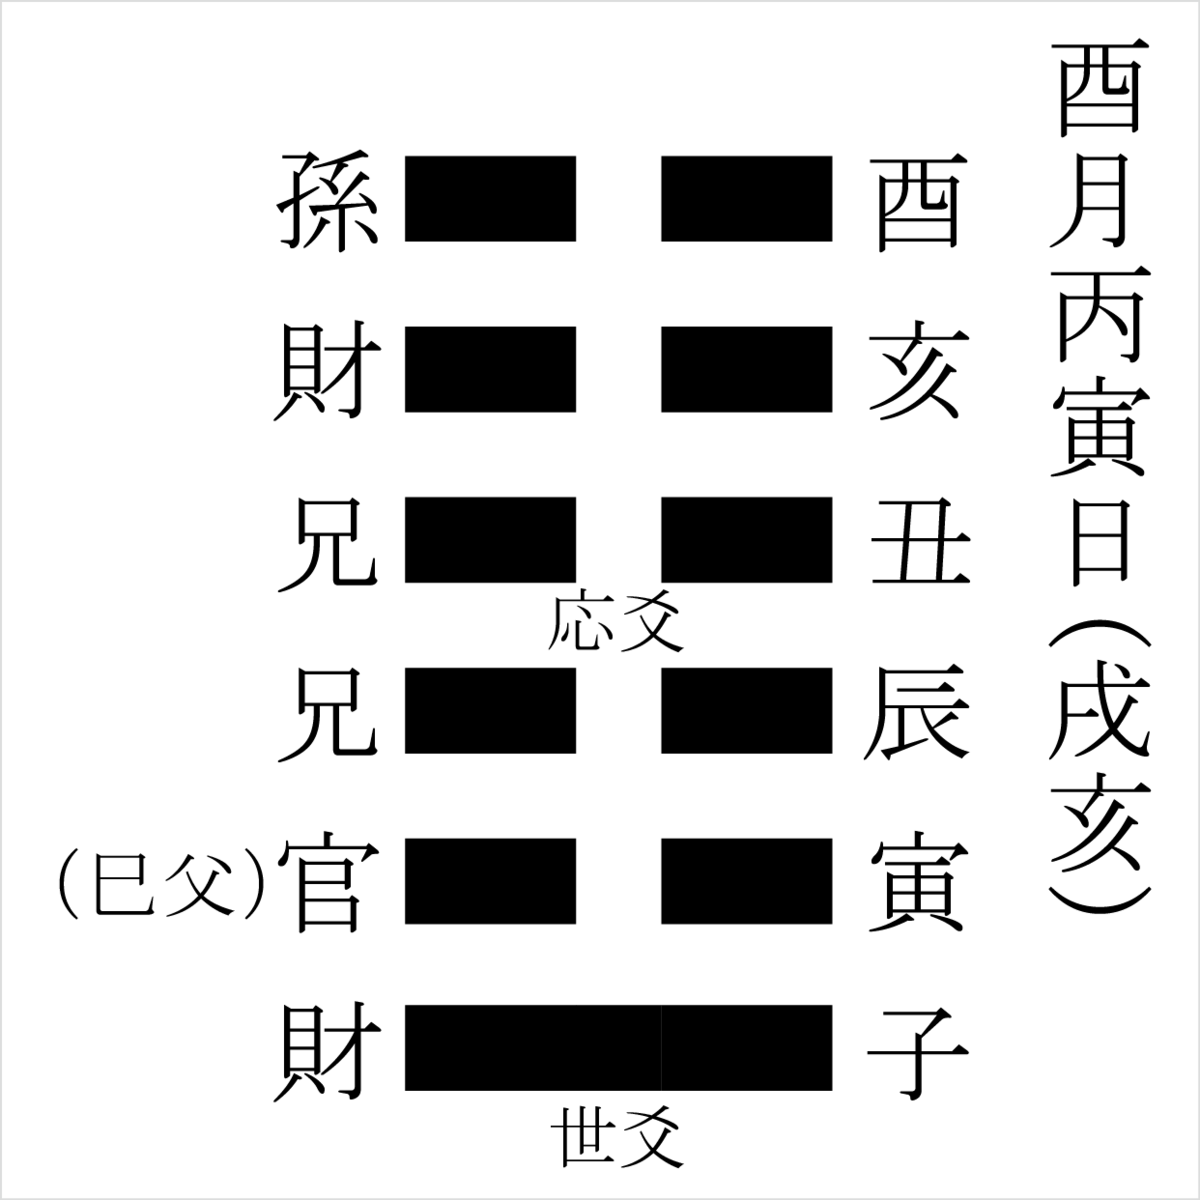 f:id:seishinenomoto:20210915133923p:plain